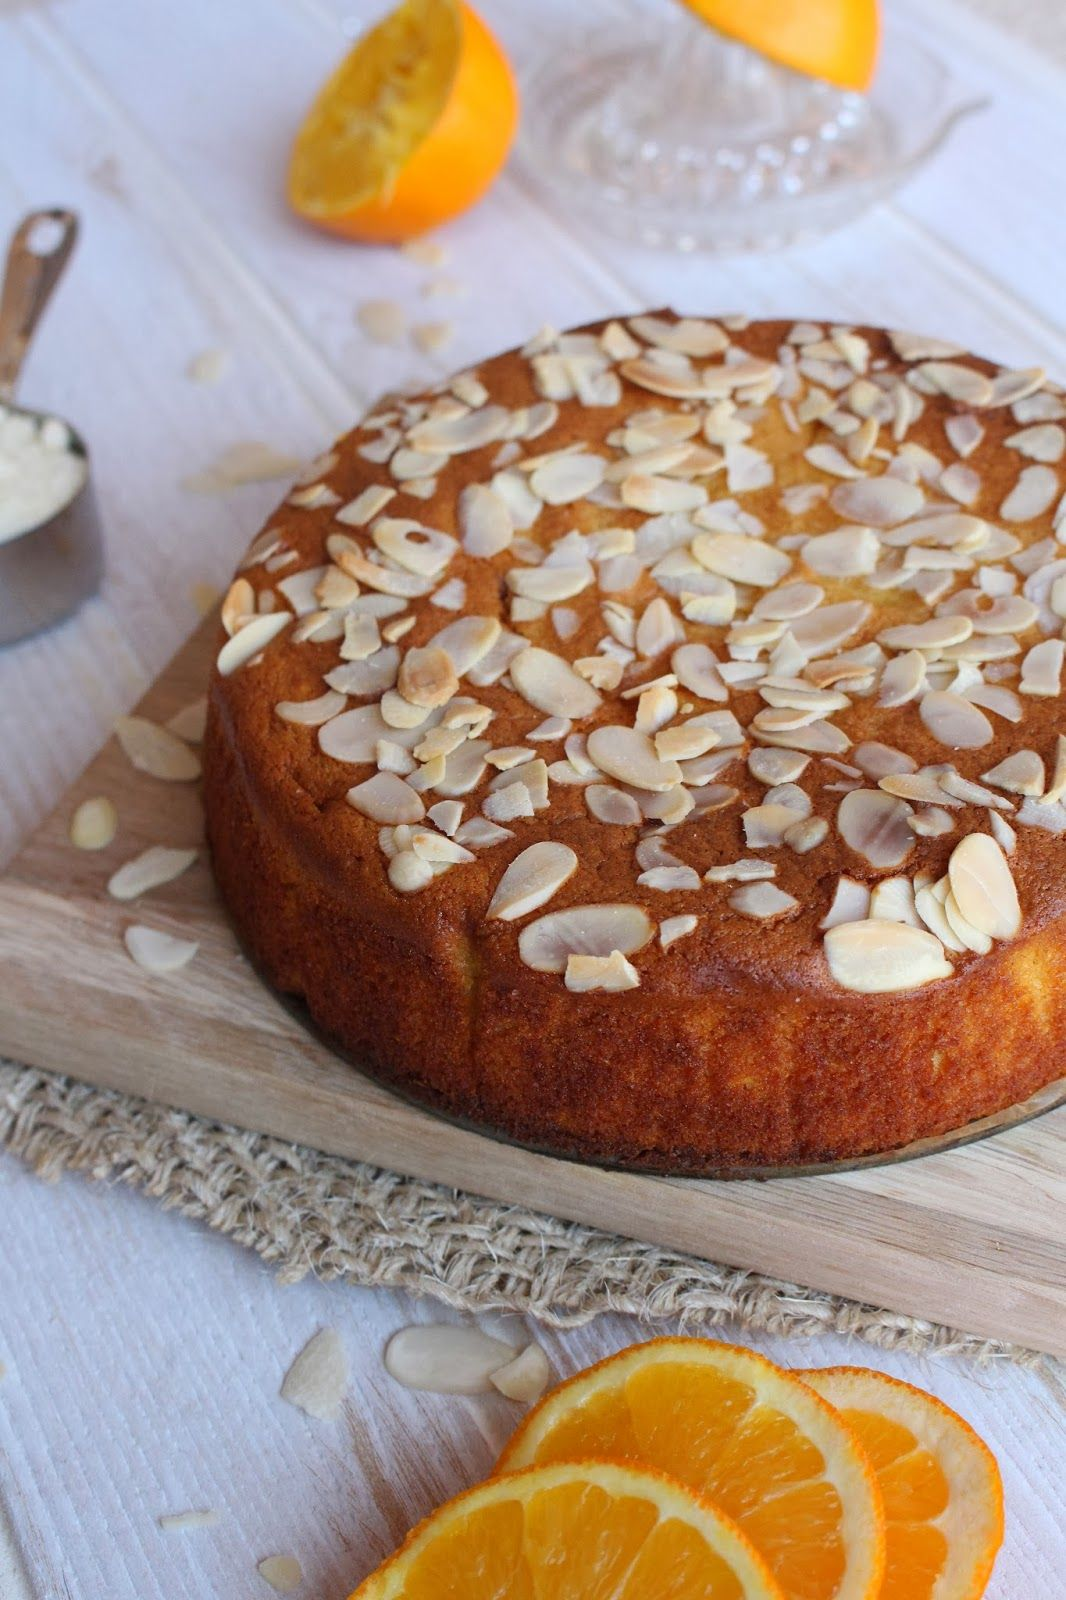 Spiced Flourless Orange Cake famished Pinterest Flourless